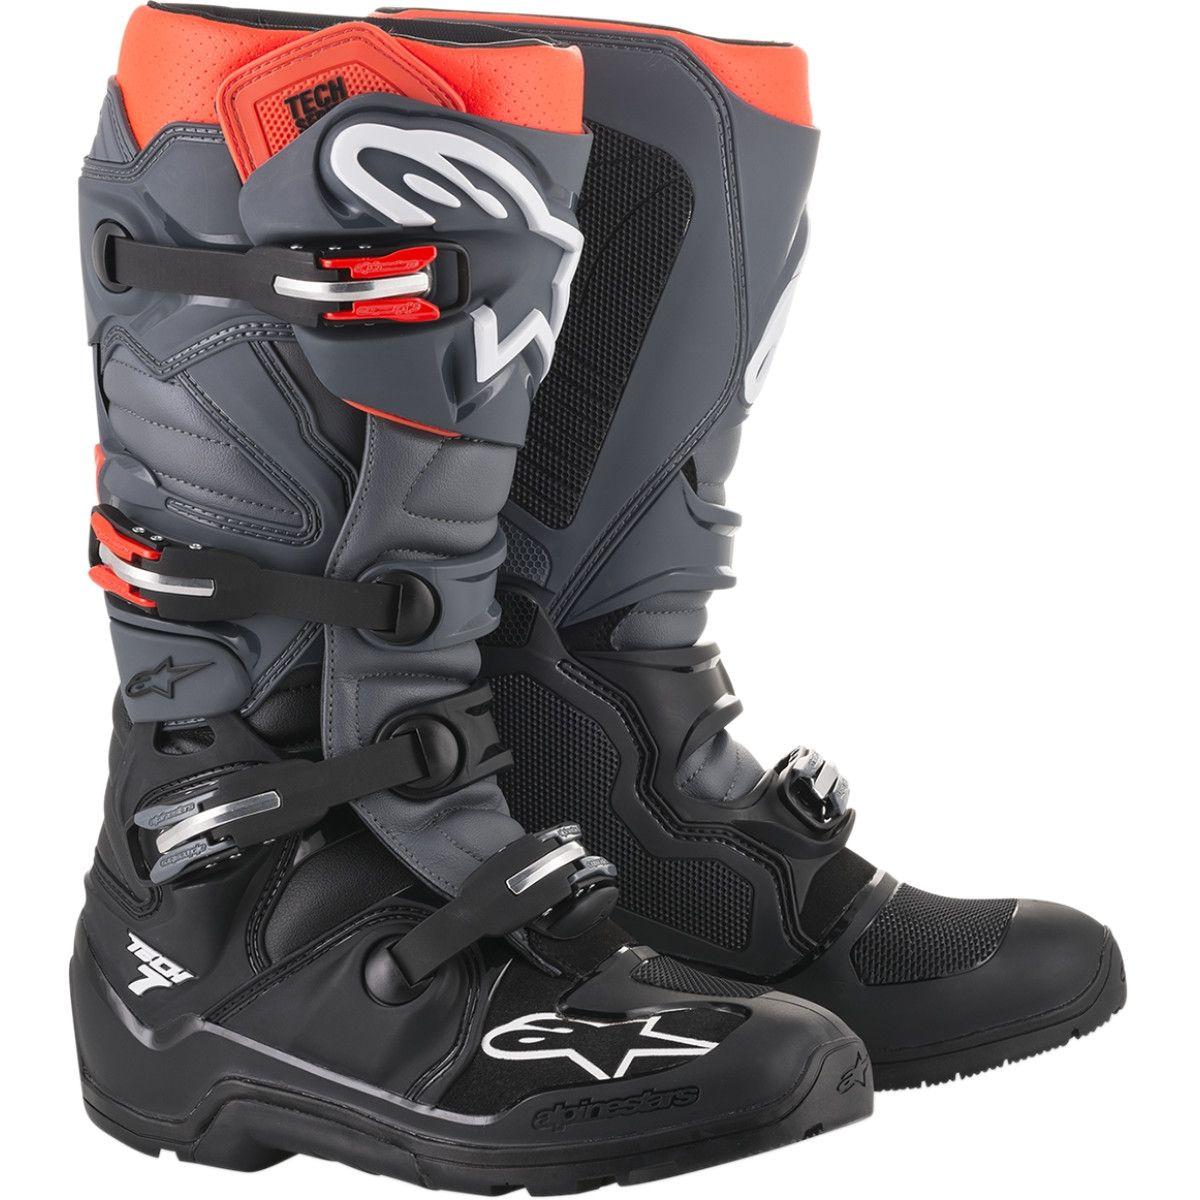 Alpinestars Crosslaarzen Tech 7 Enduro Black/Grey/Red